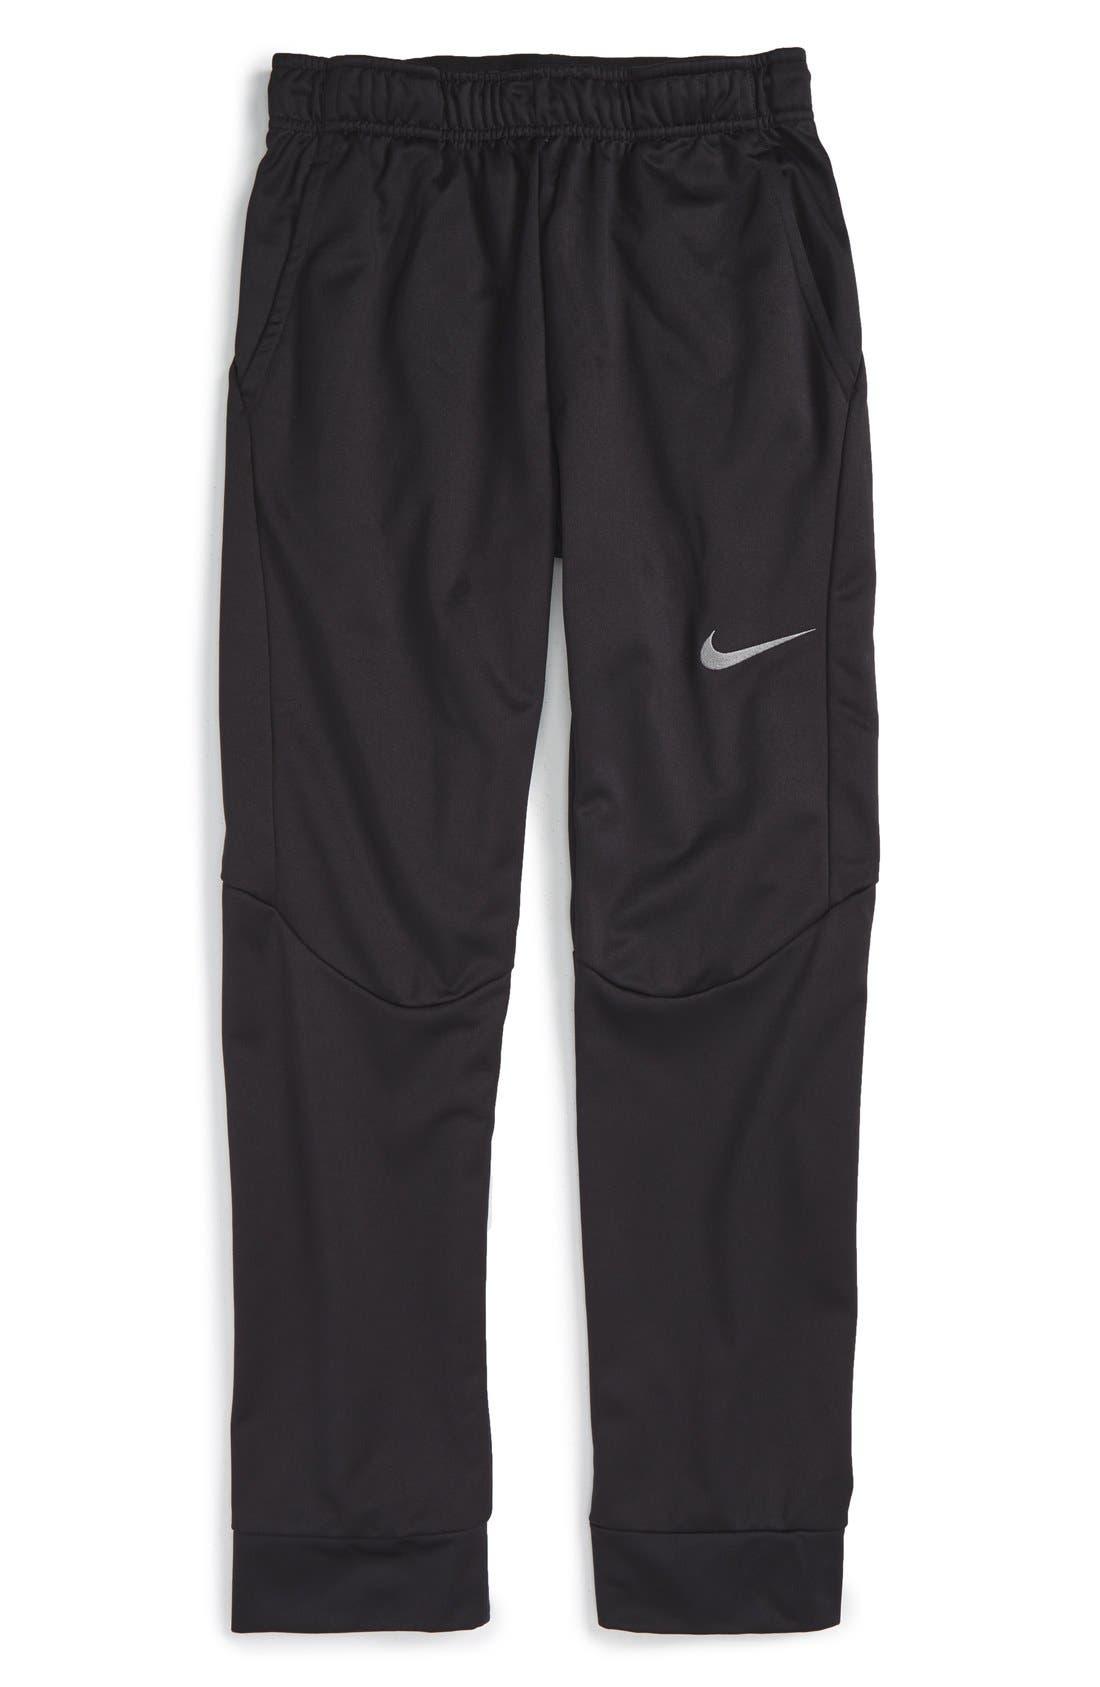 Therma-FIT Tapered Fleece Pants,                             Main thumbnail 1, color,                             Black/ Dark Steel Grey